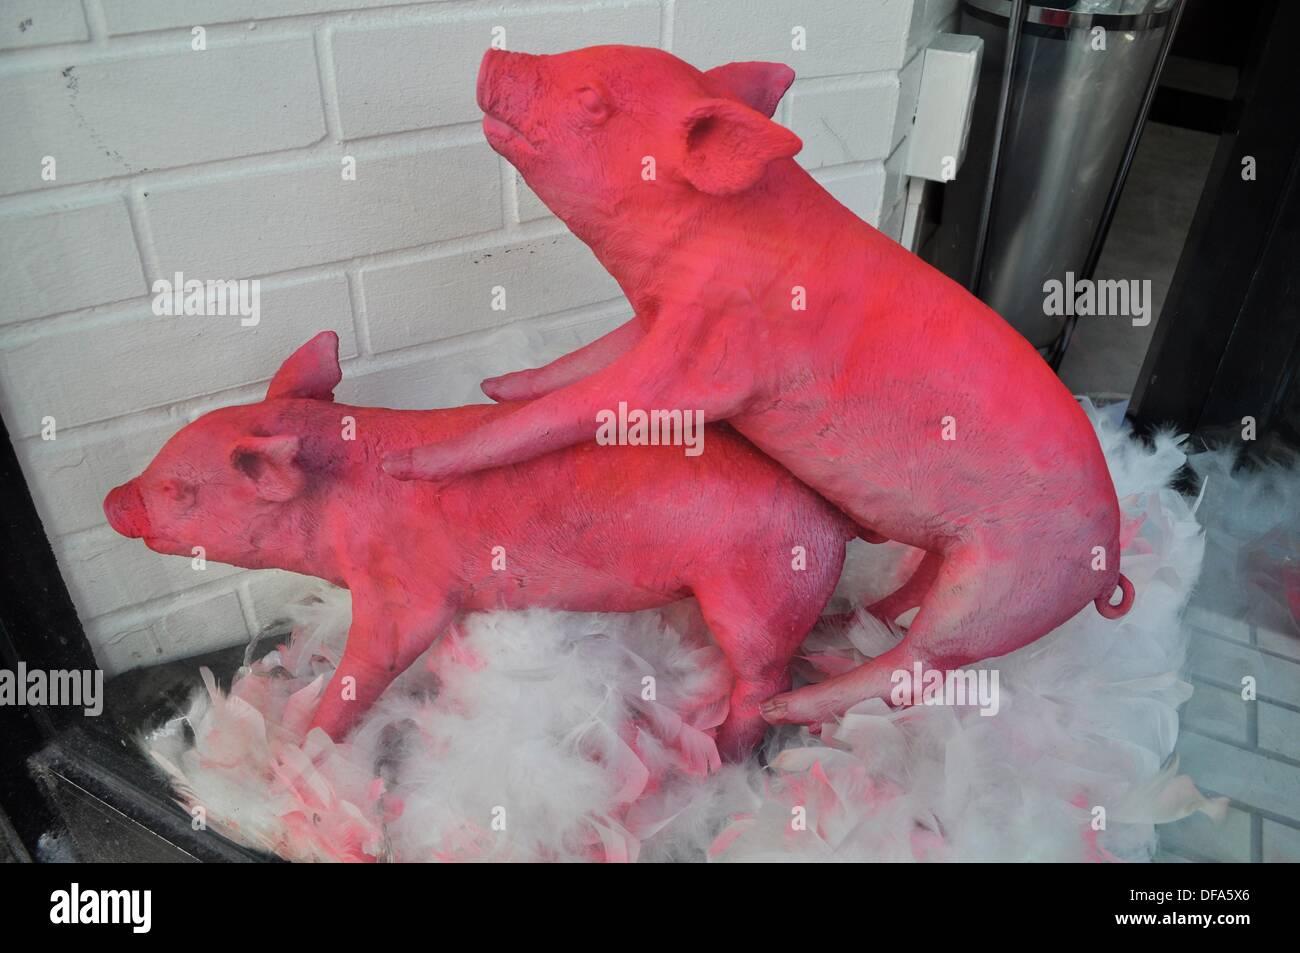 Japanese pig sex